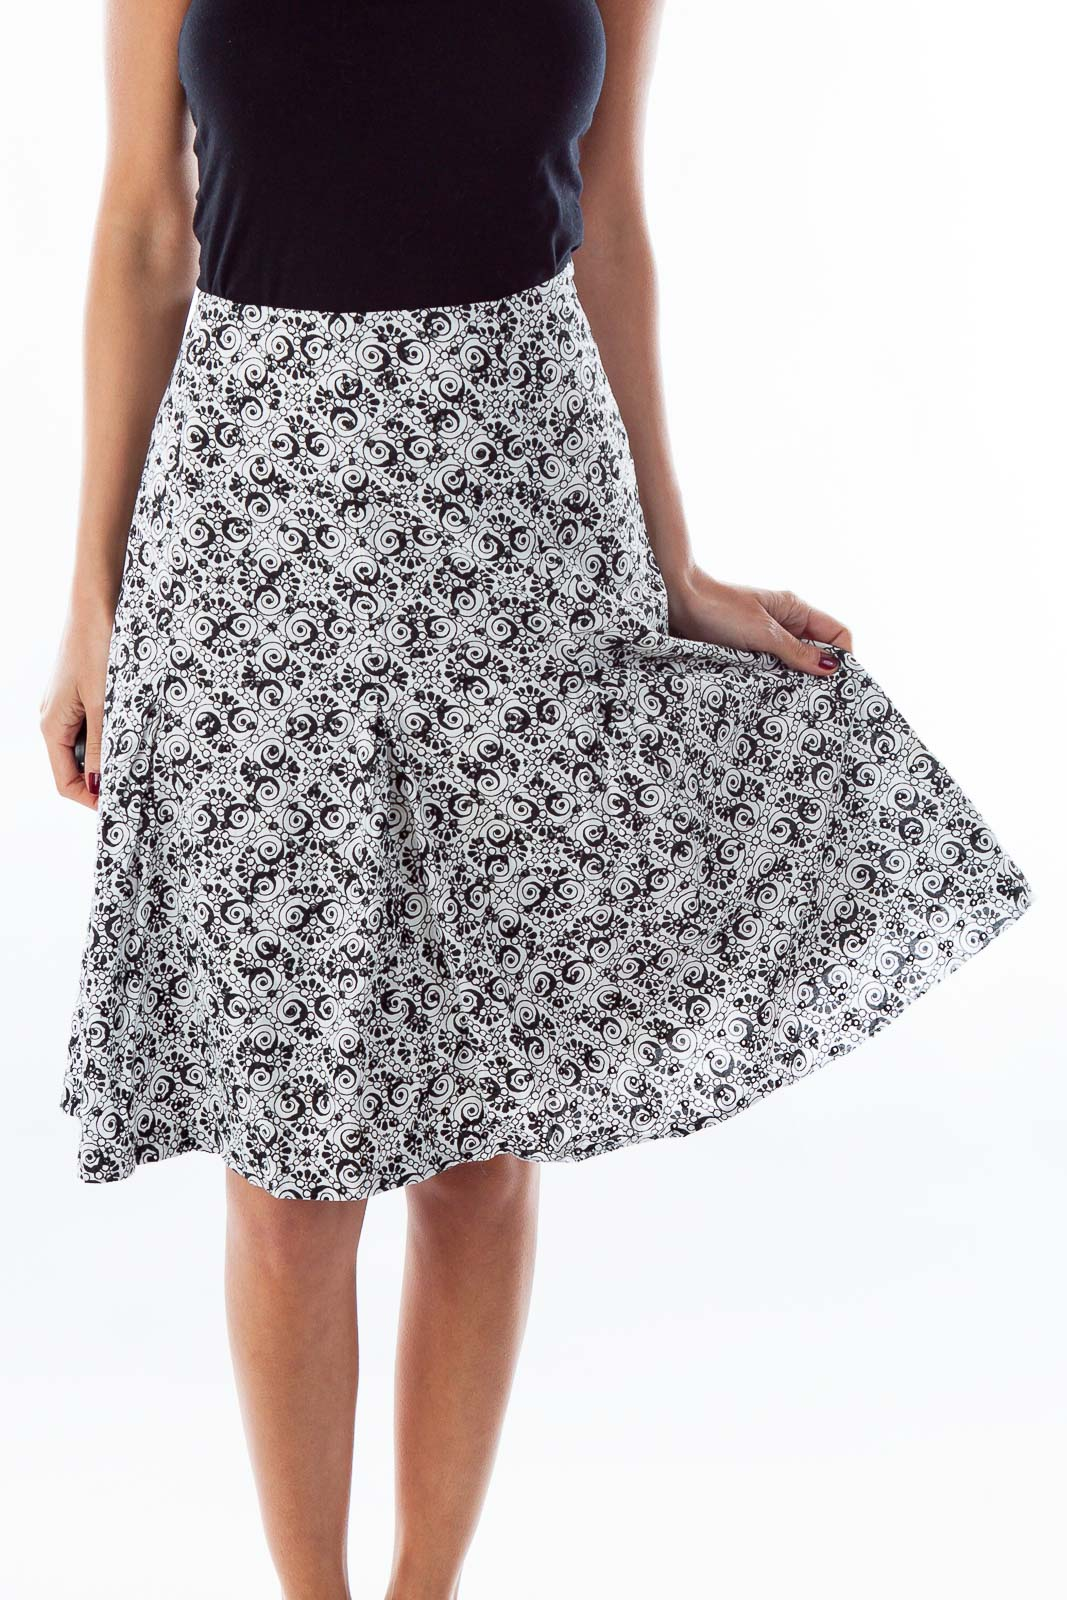 Black & White Print A-Line Skirt Front